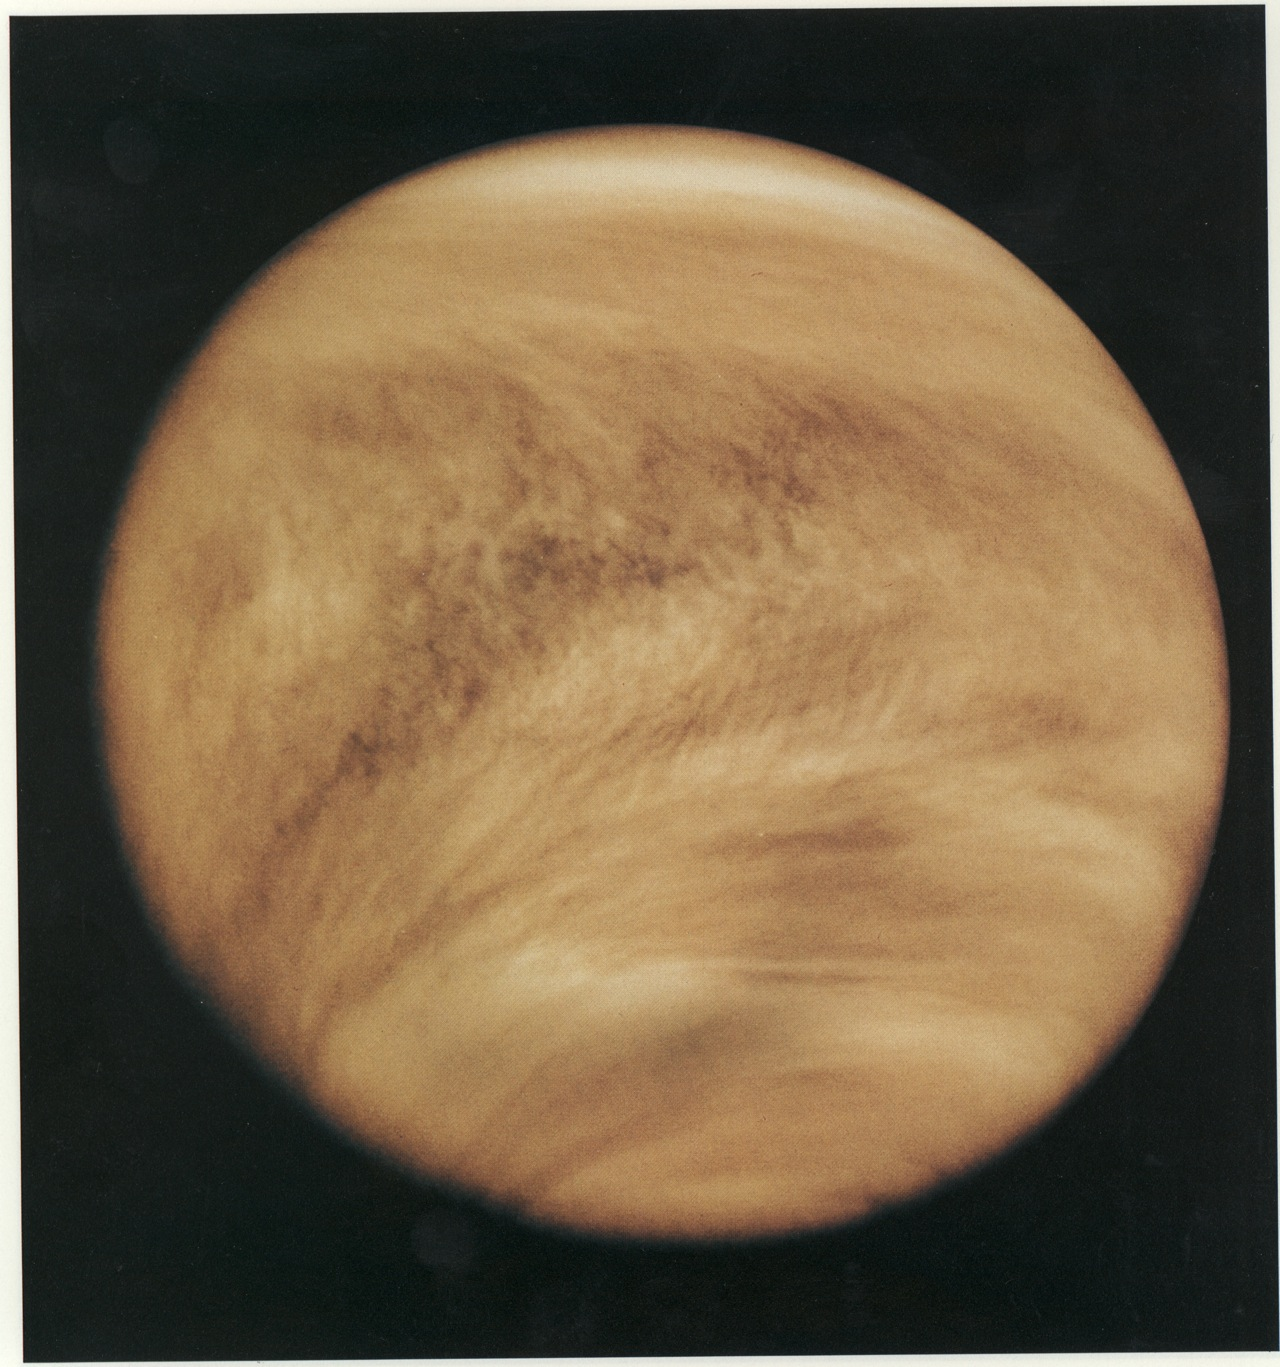 venus planet today - photo #30